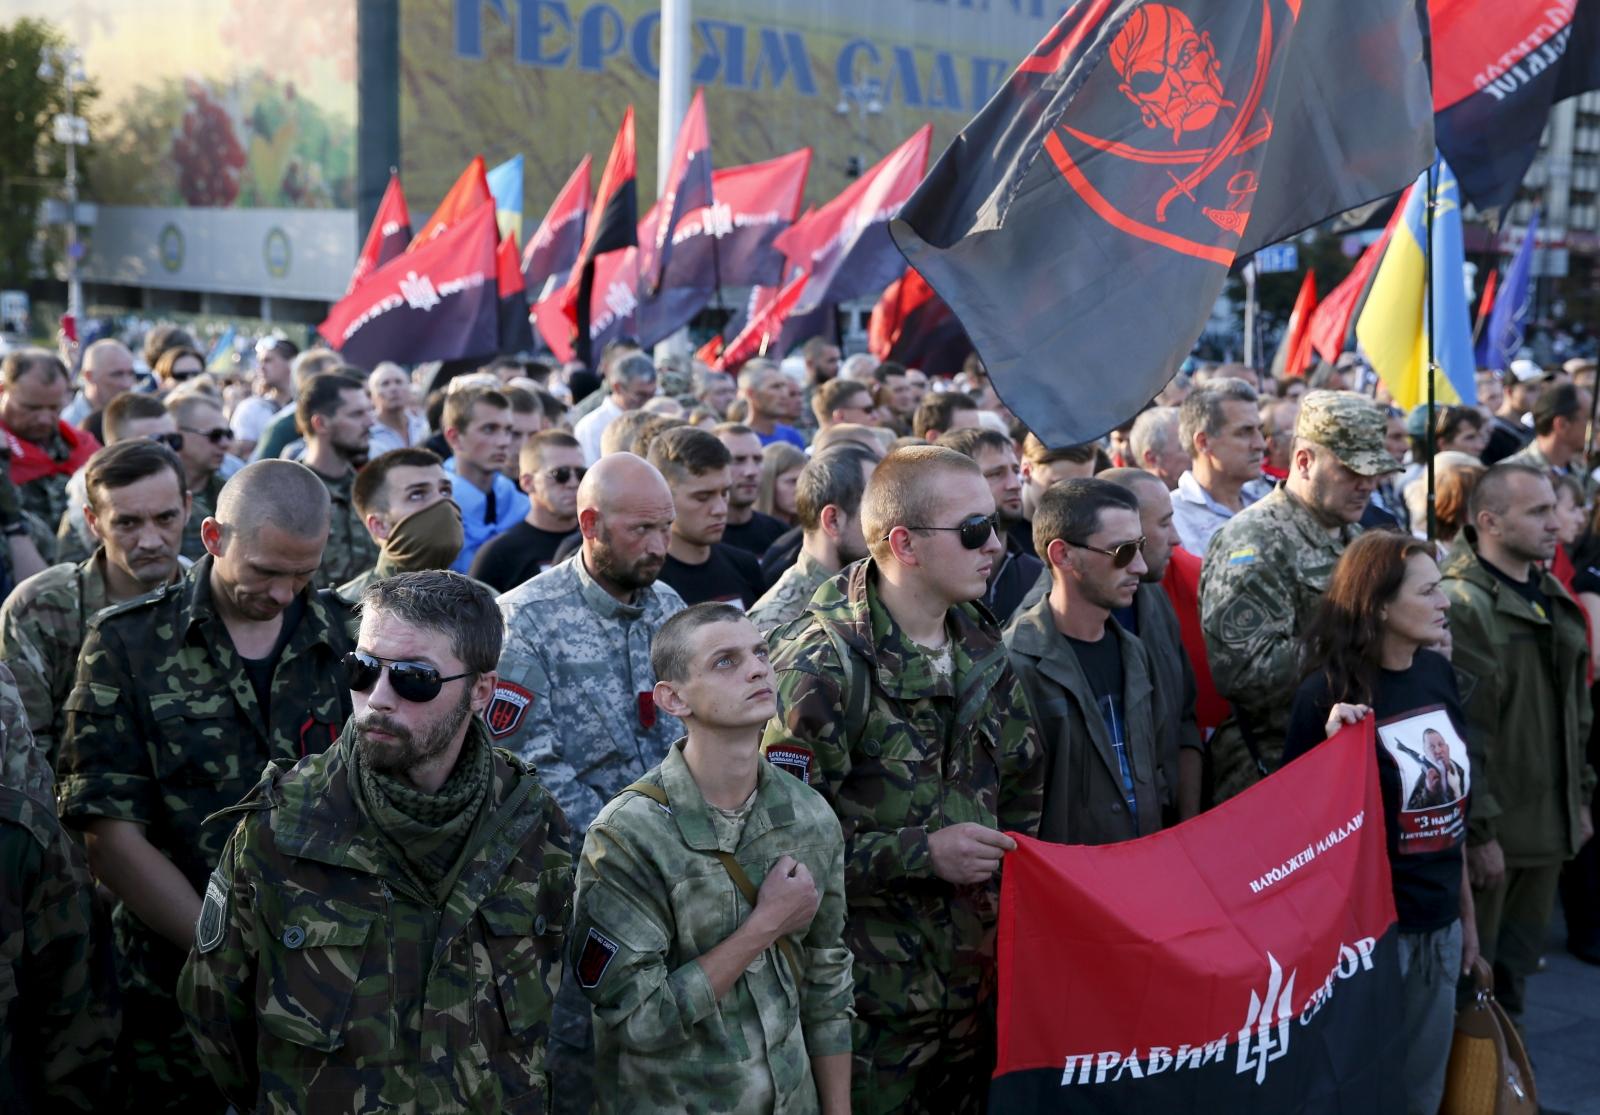 Ukraine Right Sector rally